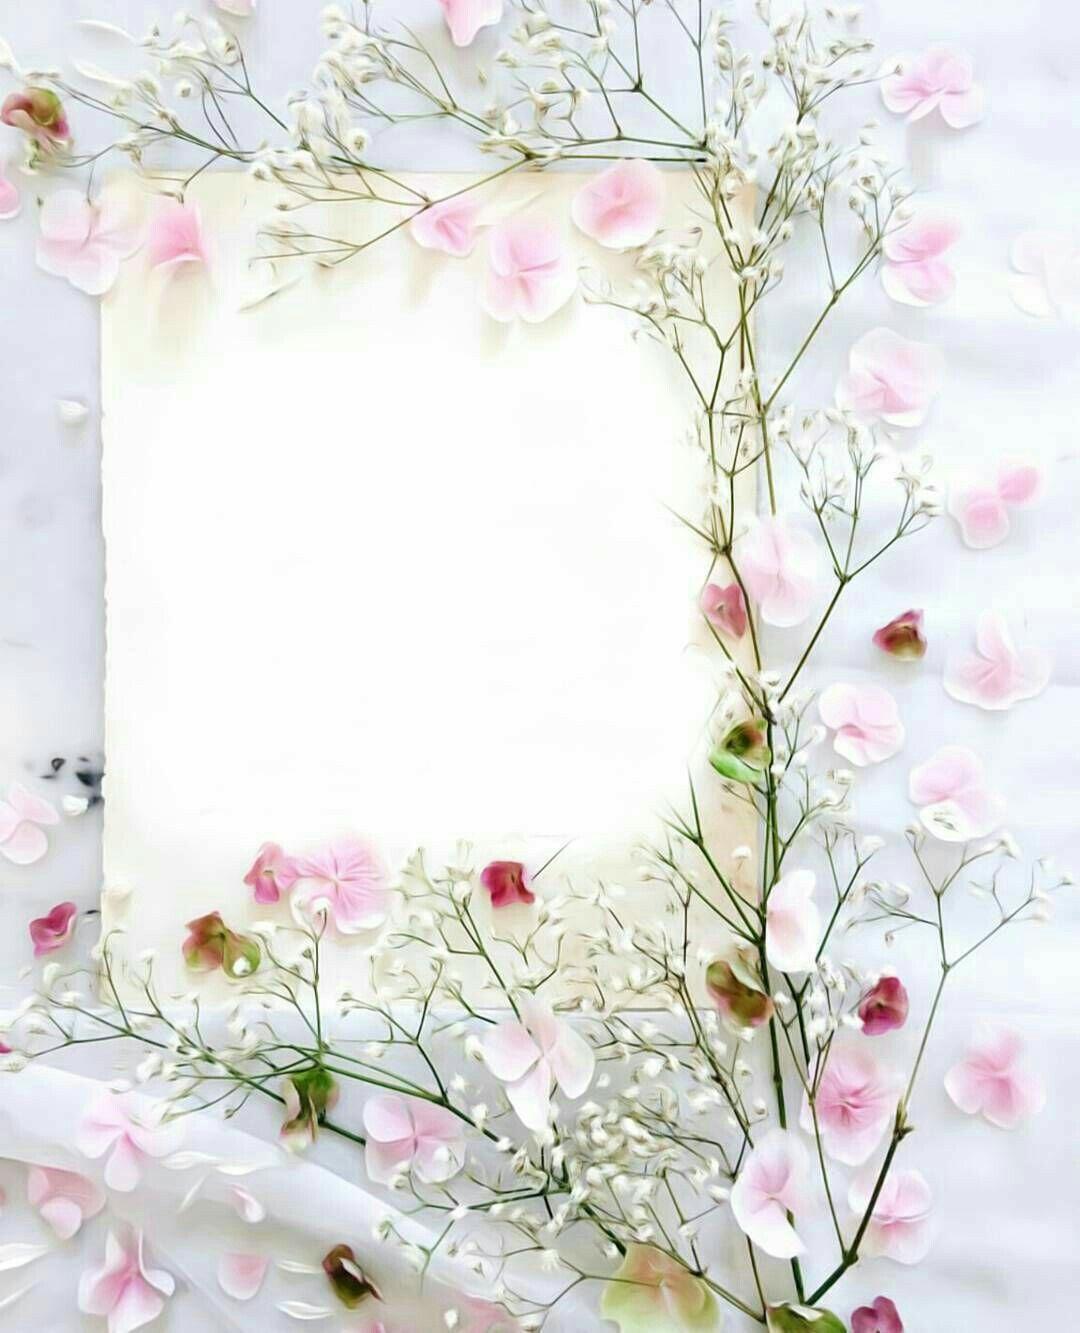 Pin By Bujang Sonang On Mcm2 Ada Flower Background Wallpaper Flower Backgrounds Floral Border Design